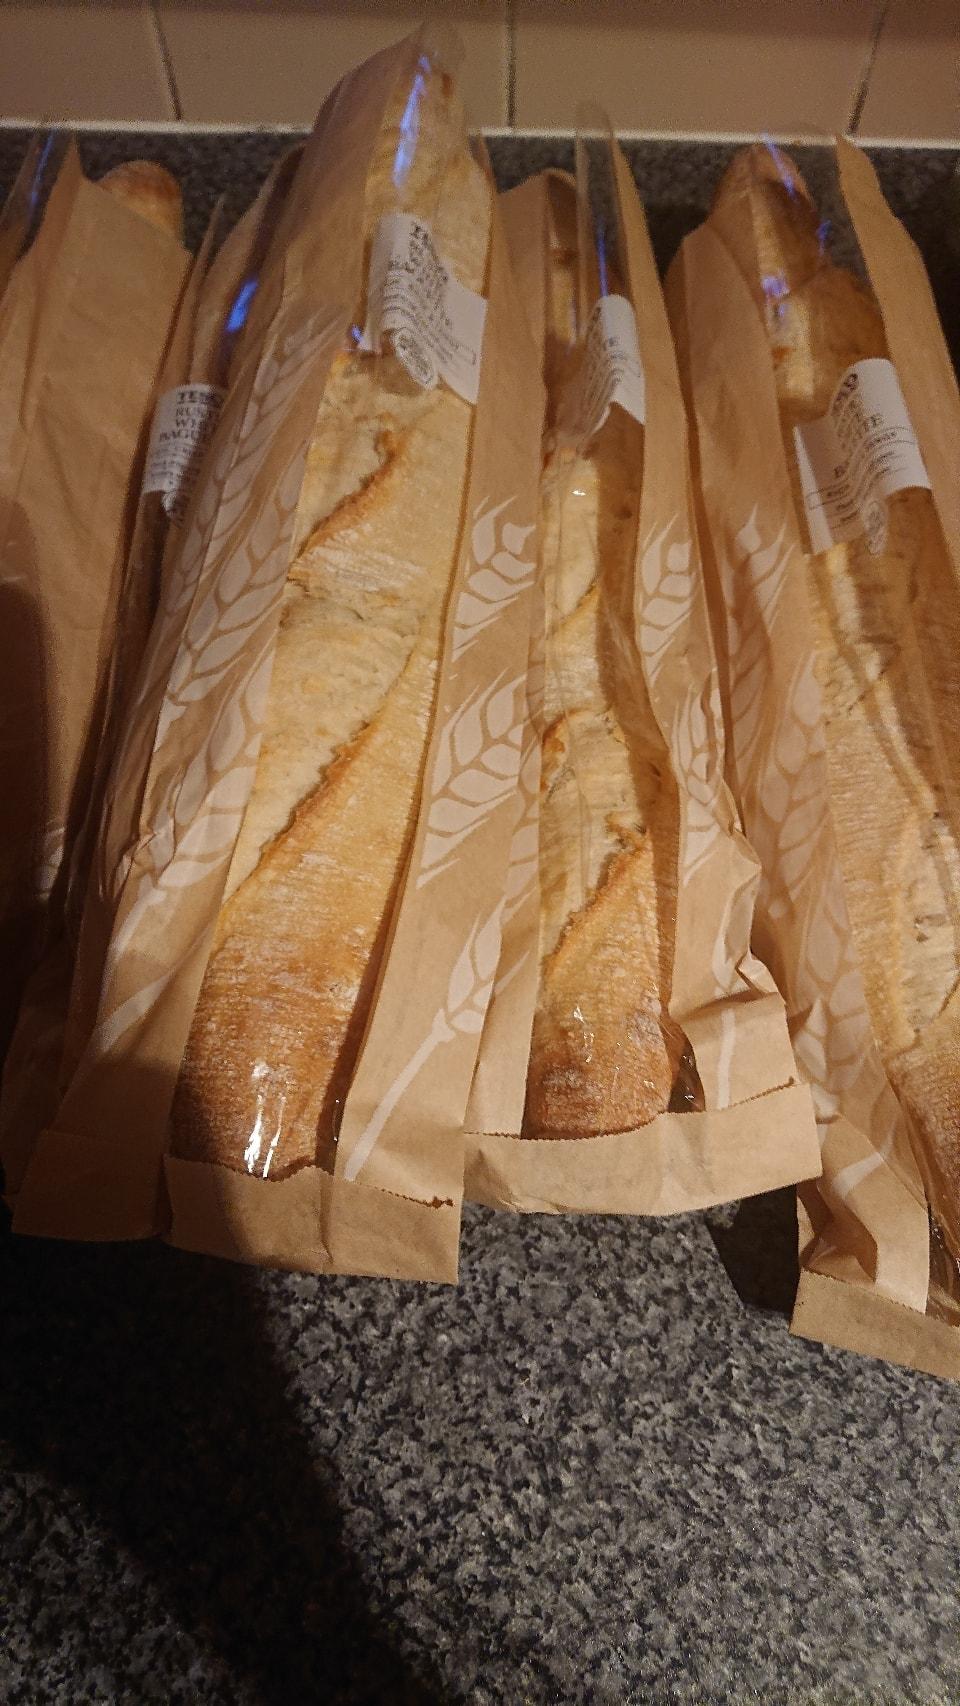 Rustic white baguette